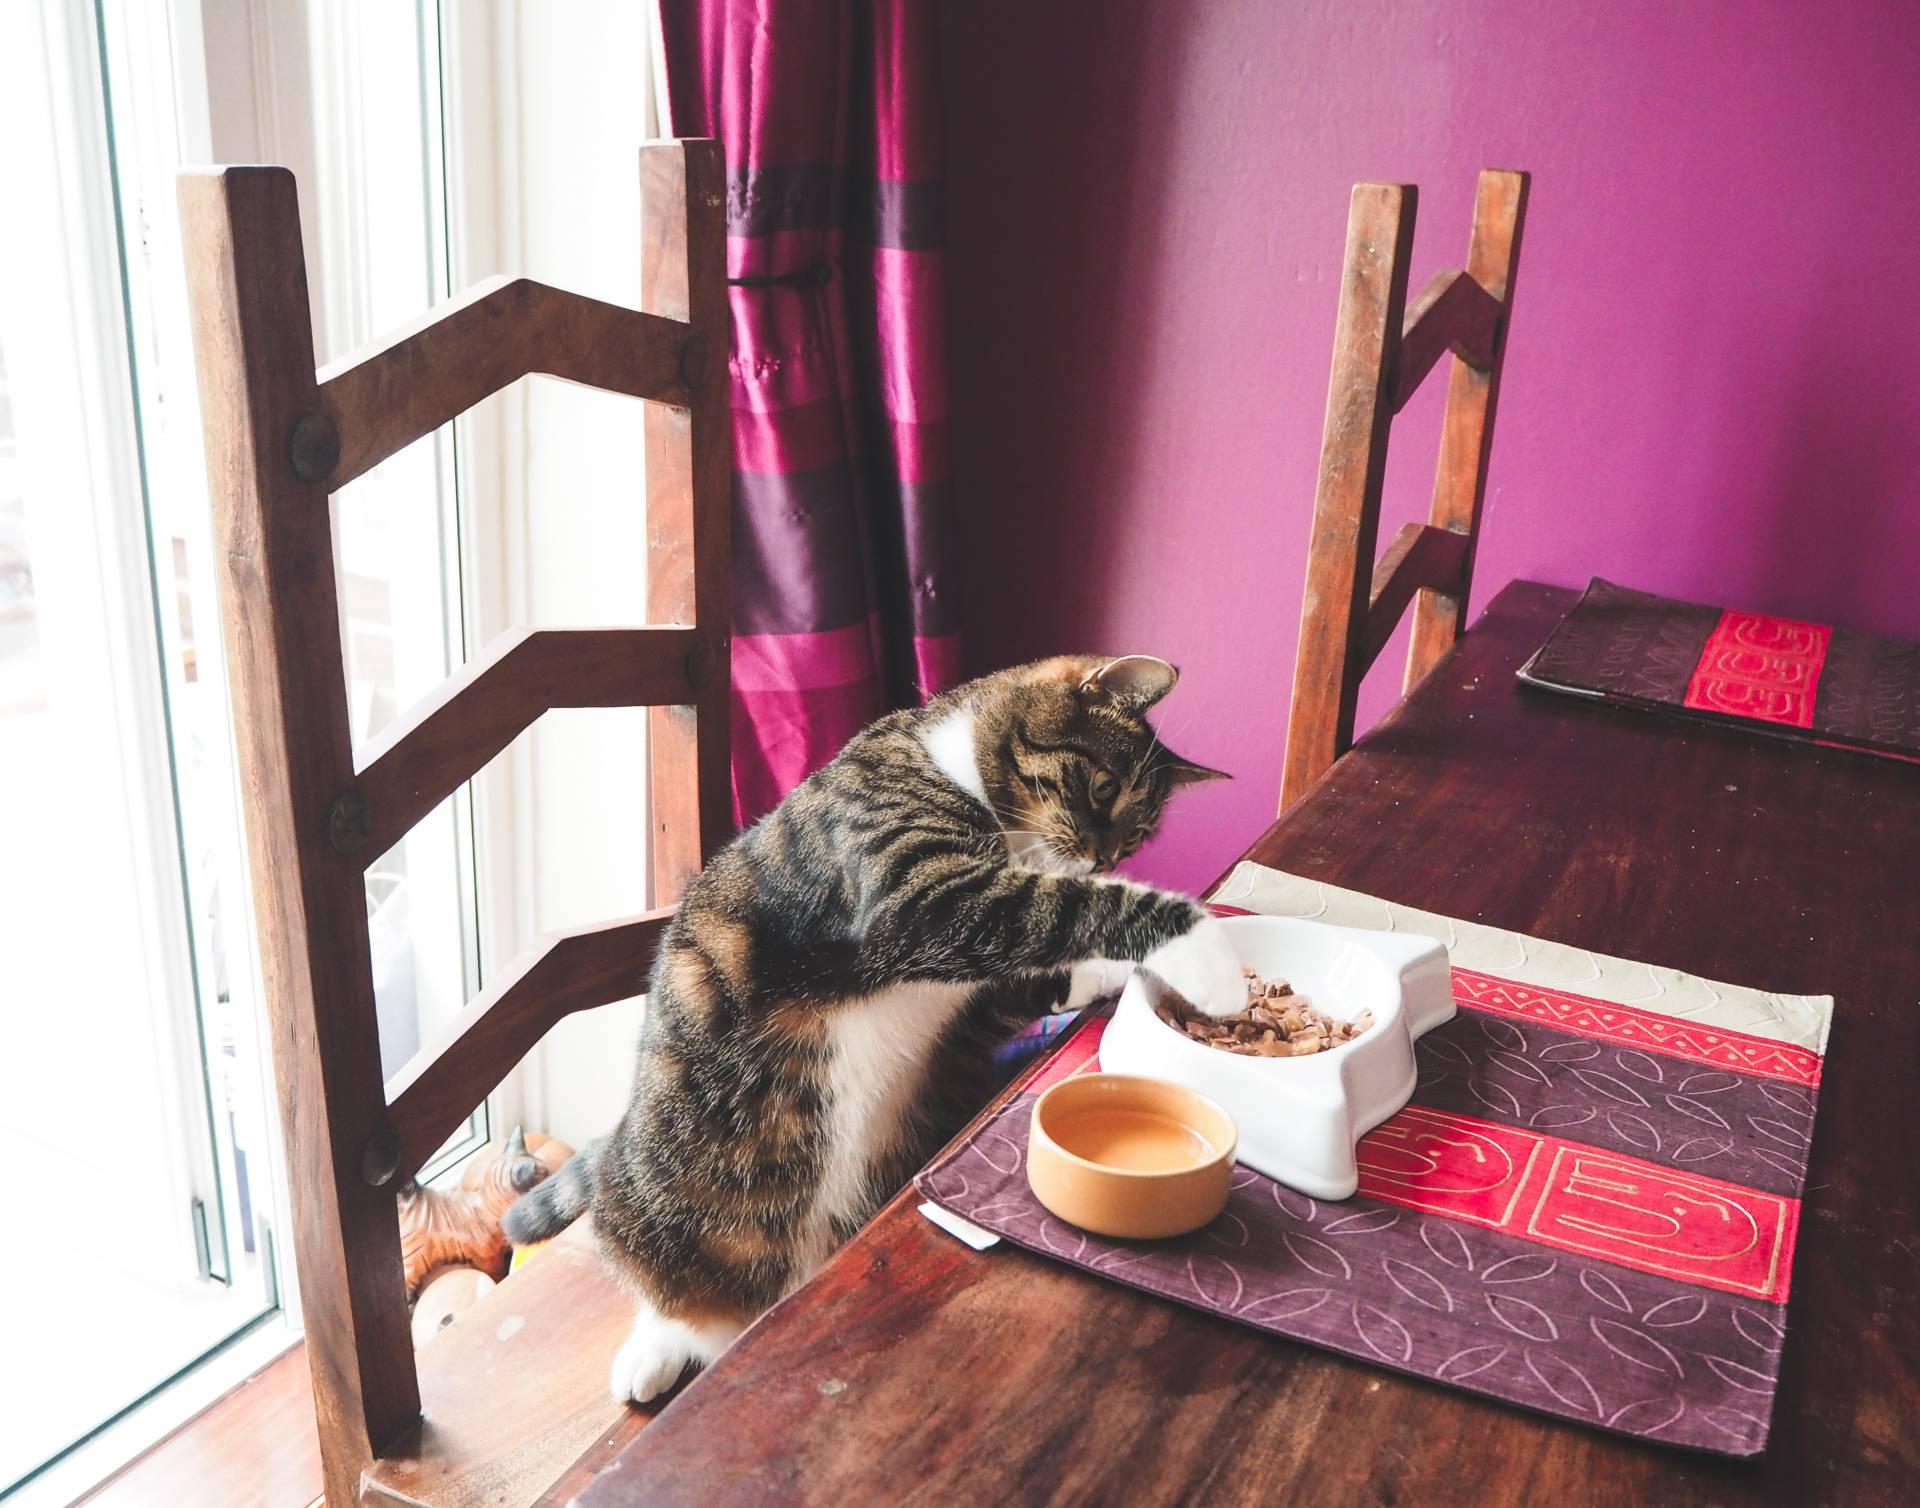 Whiskas cat casseroles - dinner date with my cat